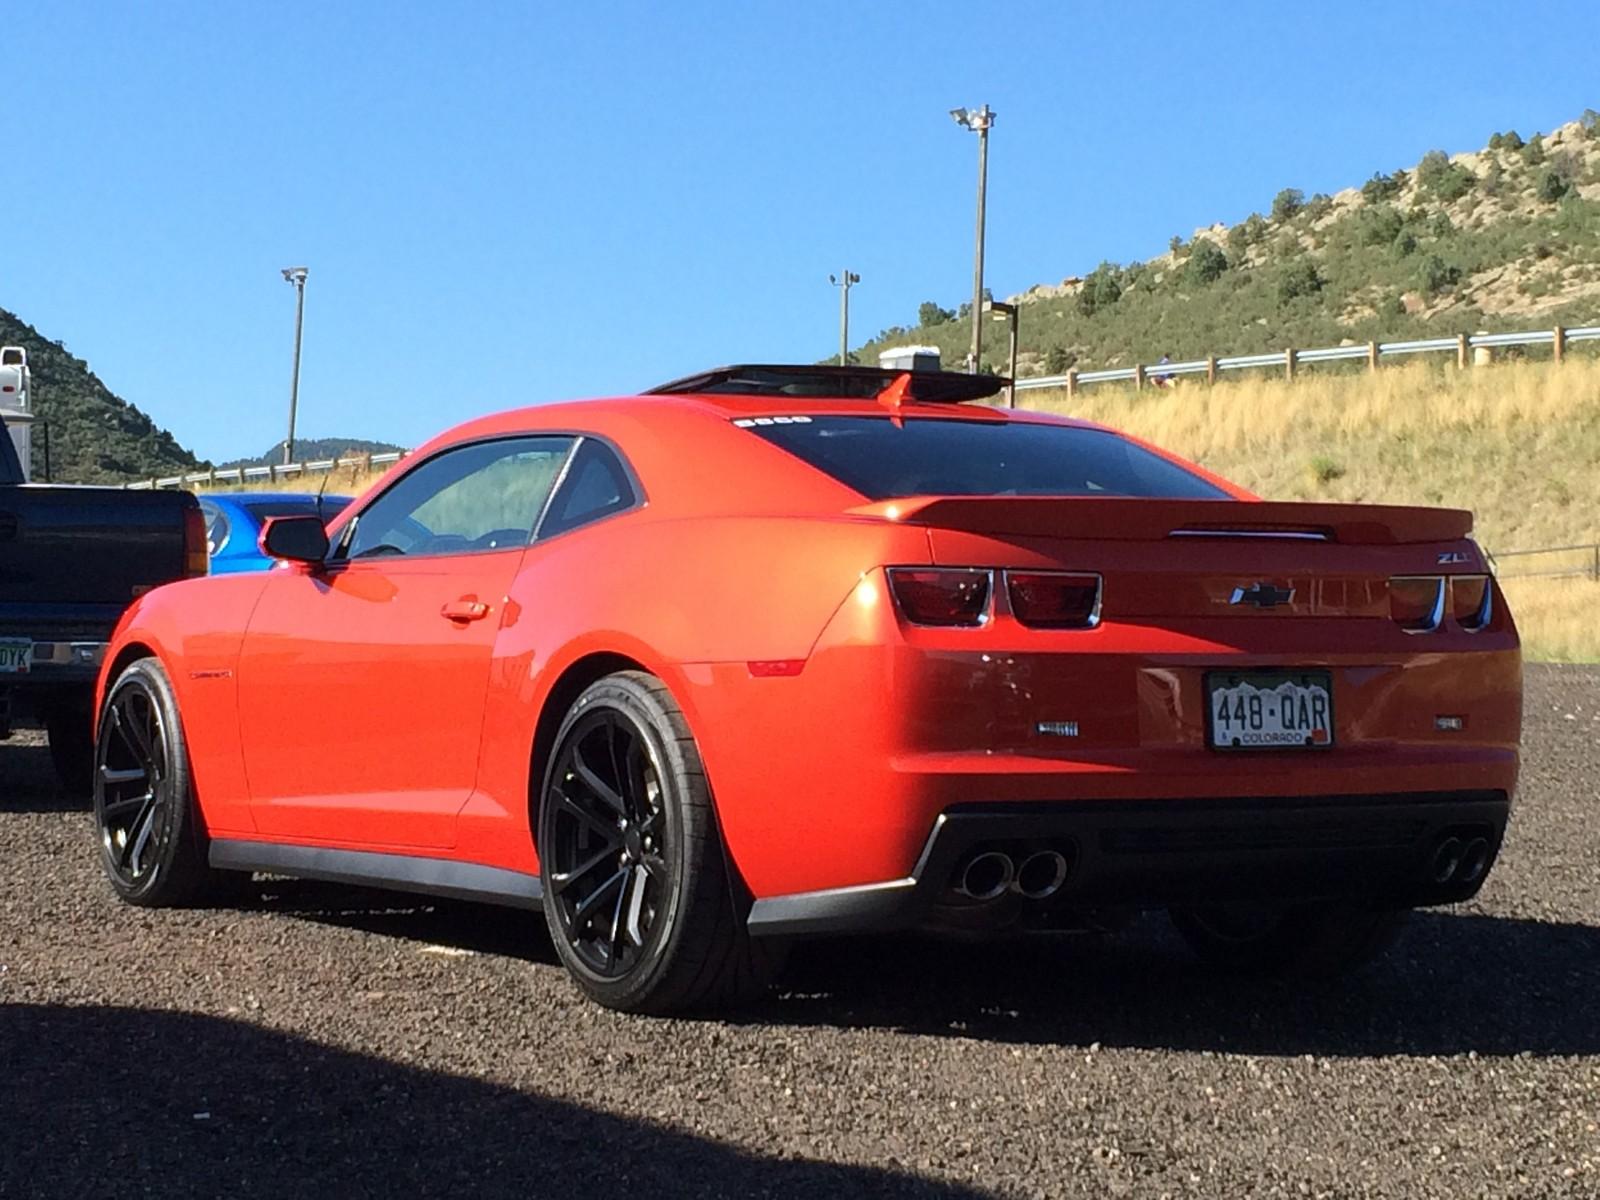 2013 Inferno Orange Metallic Chevrolet Camaro Zl1 Pictures Mods